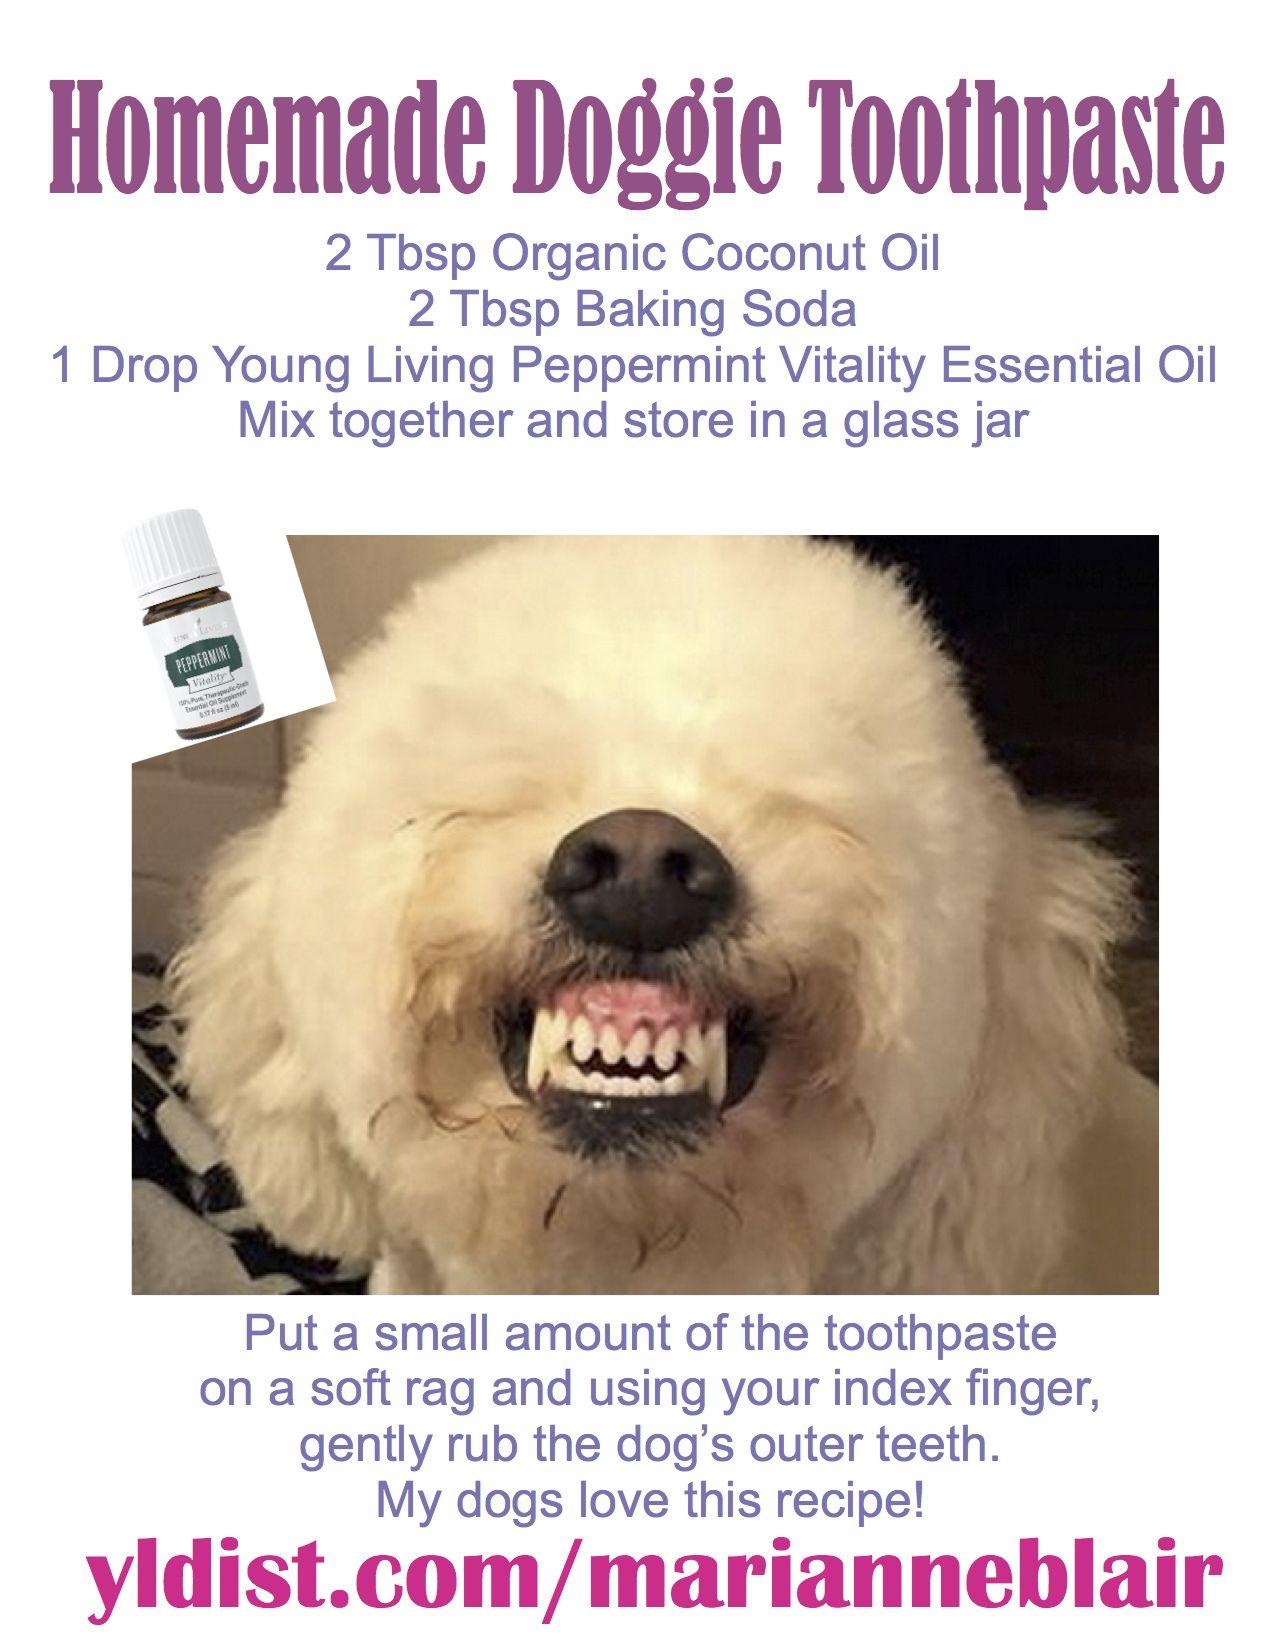 Homemade Dog Toothpaste Dog Toothpaste Diy Dog Toothpaste